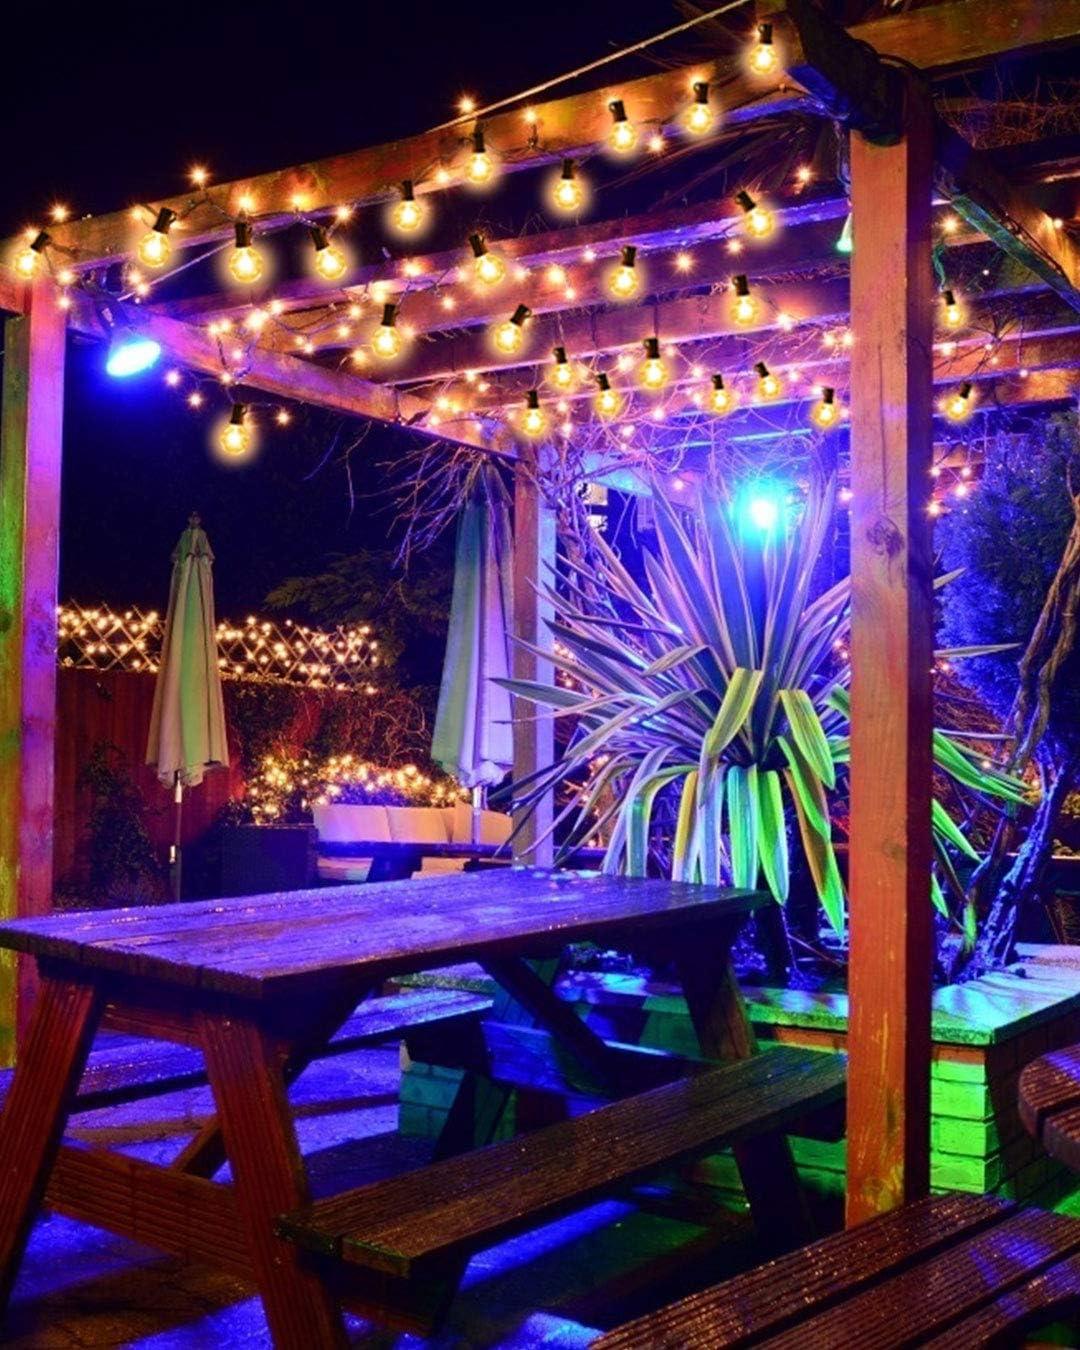 Guirnaldas luminosas de exterior,G40 Vintage Edison Bulbs 30 Enchufes Colgantes, Luces Colgantes de Interior/Exterior para Patio, Jardín, Patio ...